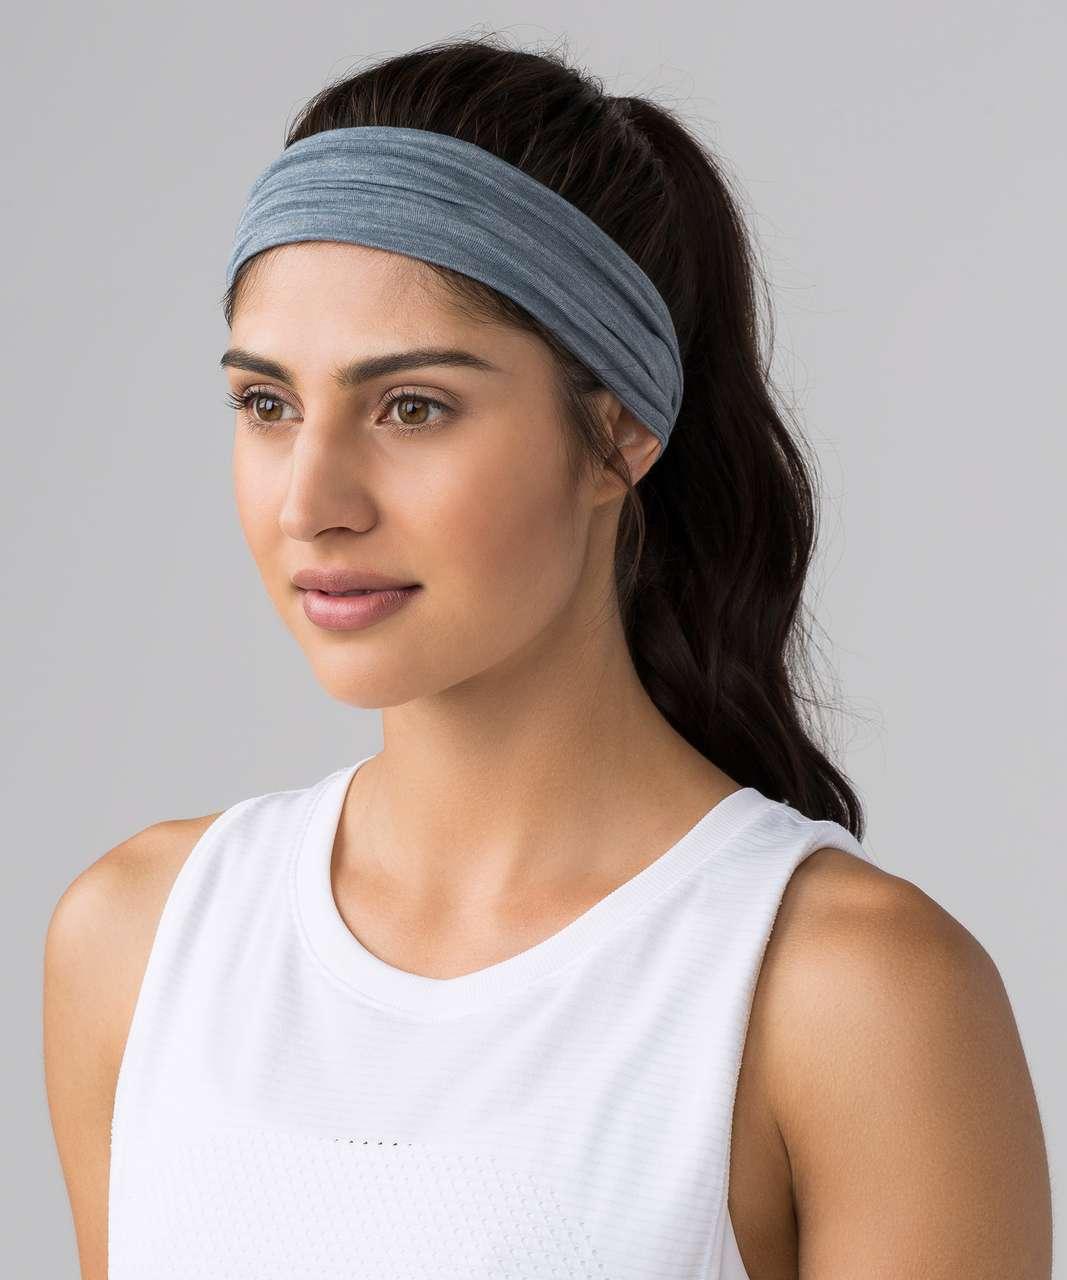 Lululemon Fringe Fighter Headband - Heathered Sterling / Heathered Sterling